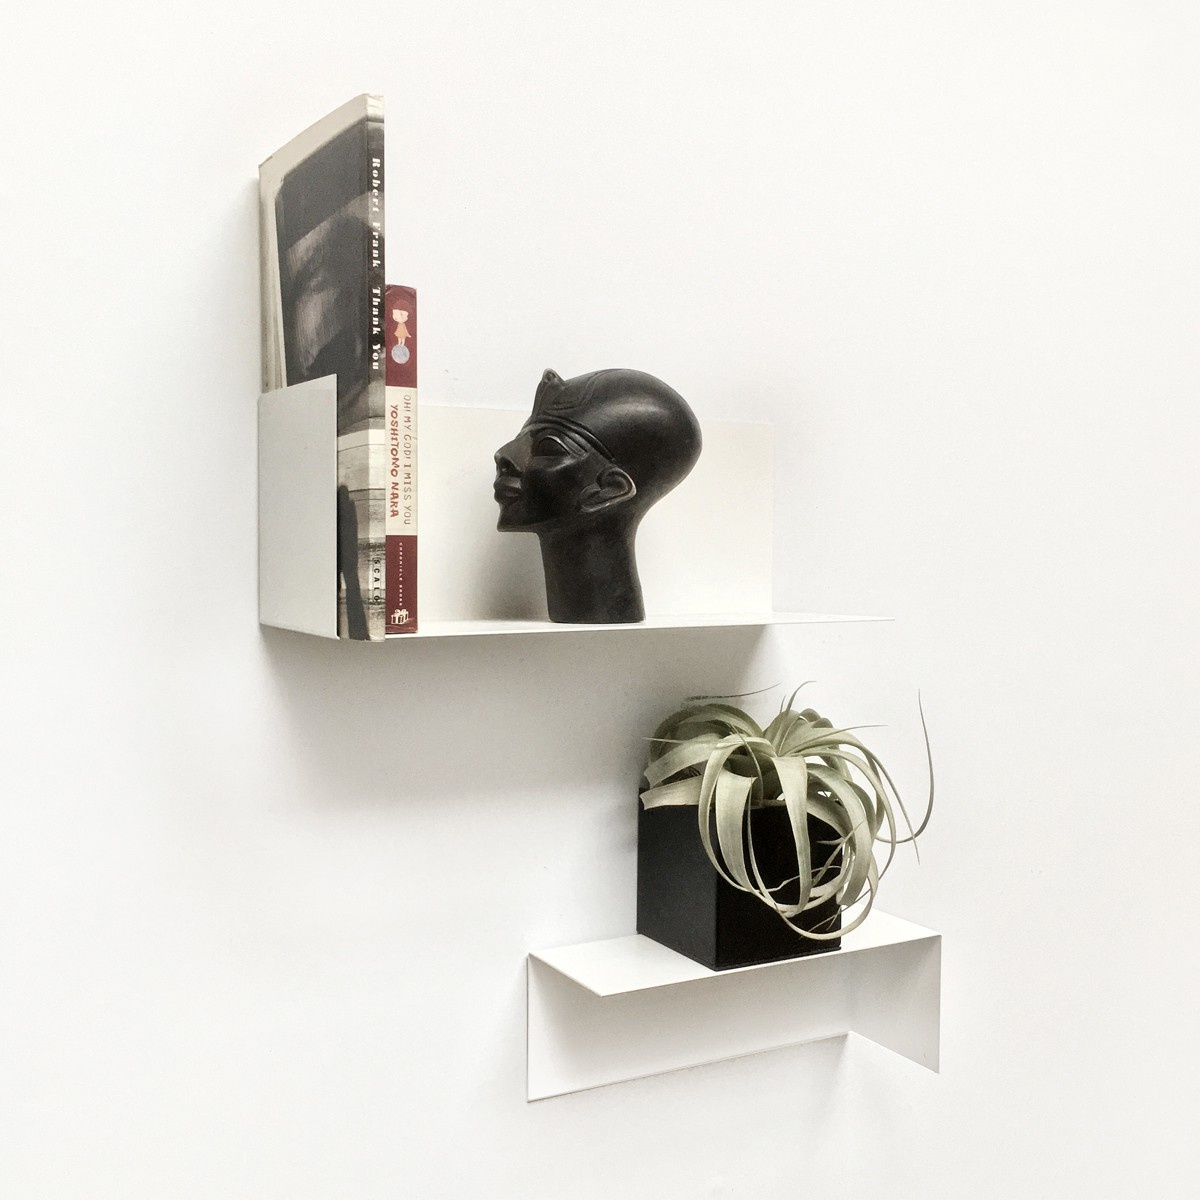 Groovy Magnets magnetisch wandplankje staal, wit